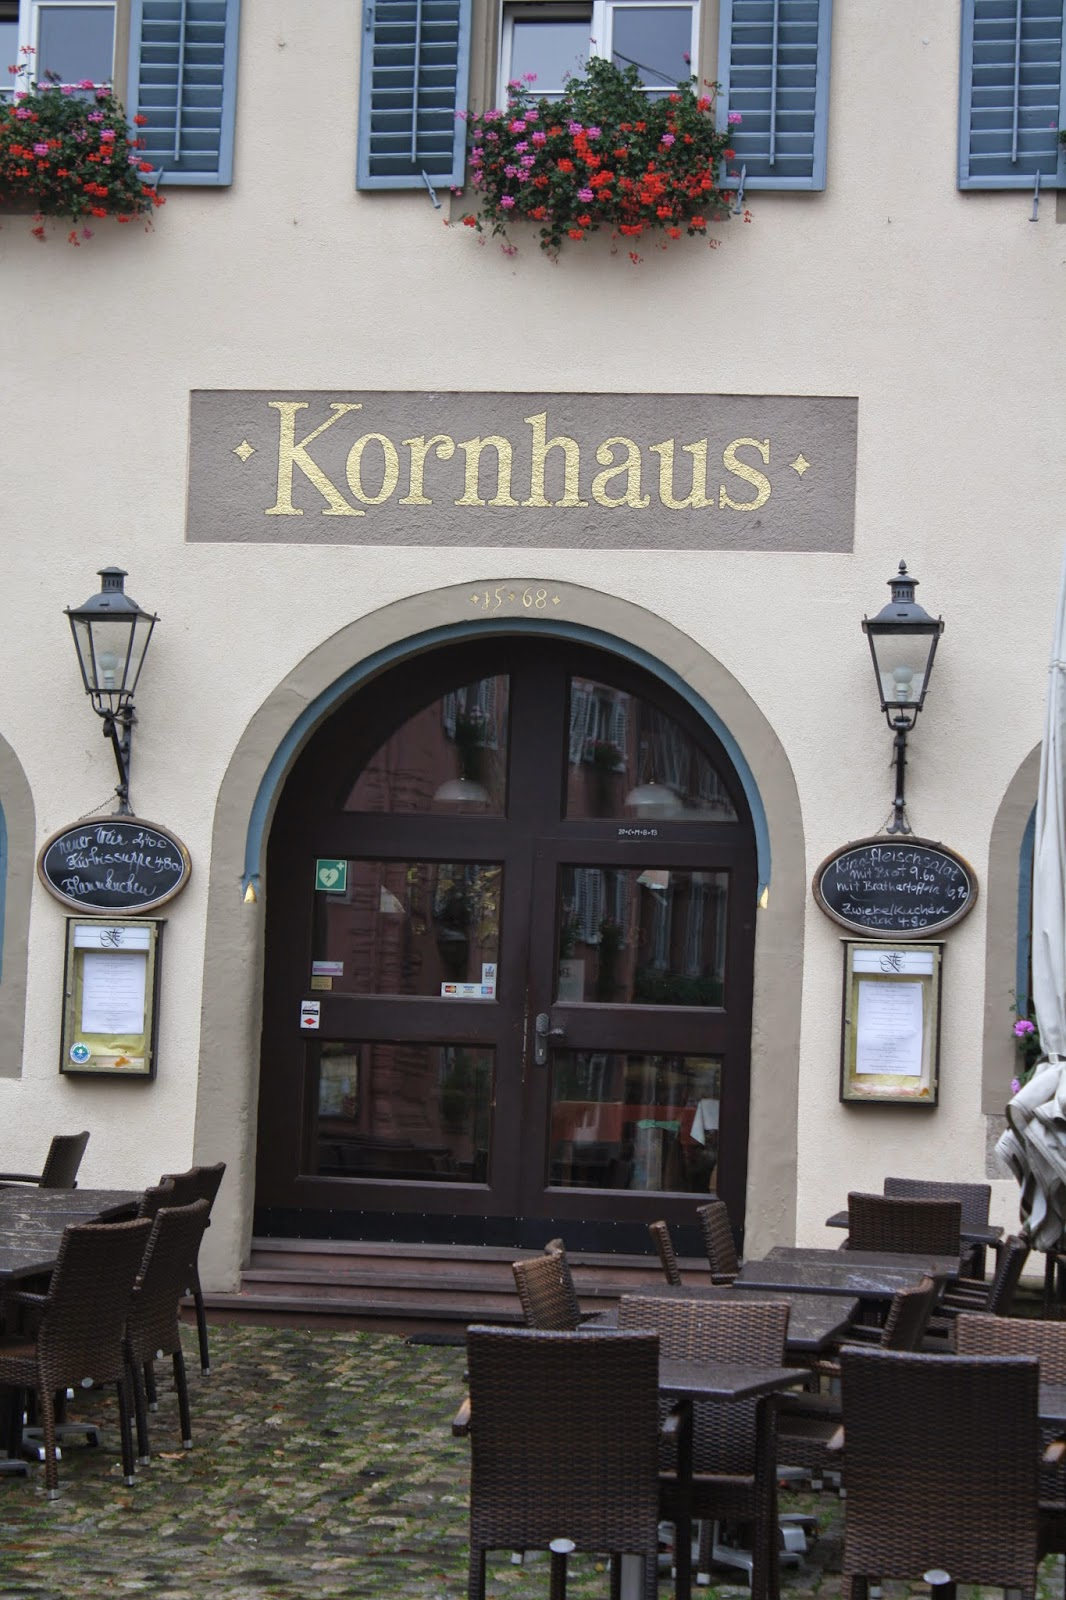 Kornhaus cafe